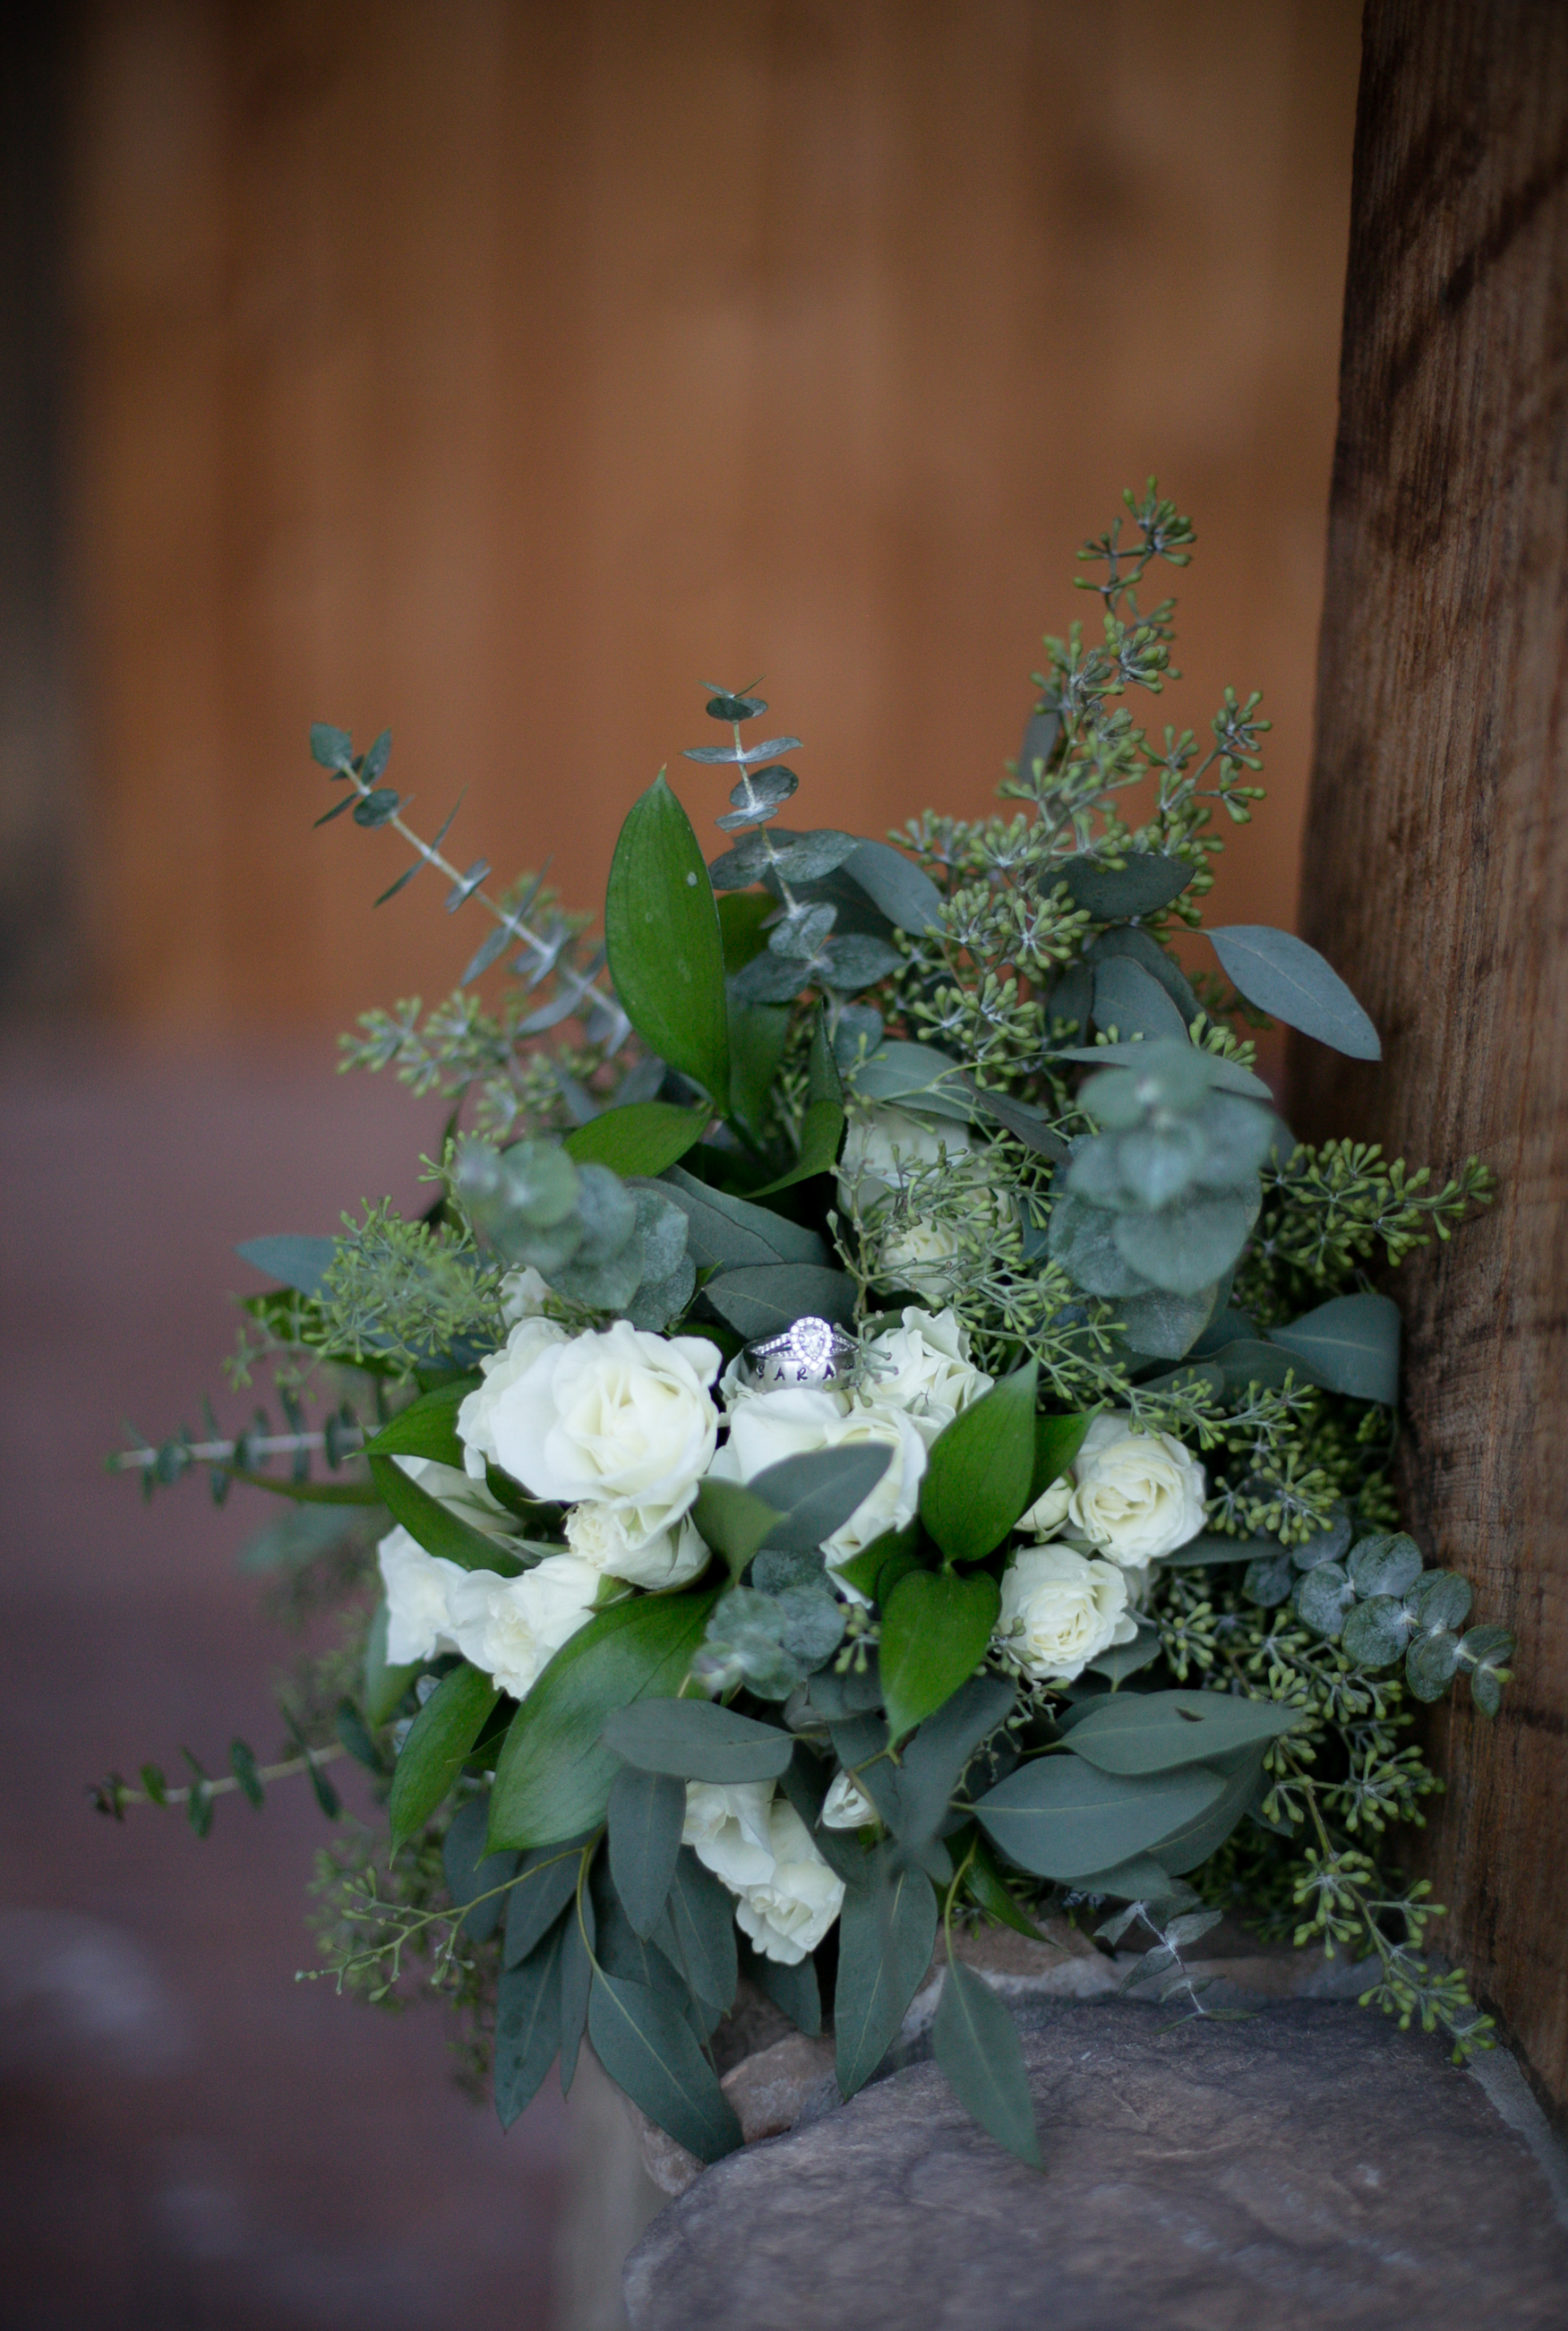 Luke_Sarah_Calaway_Wedding_12Aug17_1067.jpg